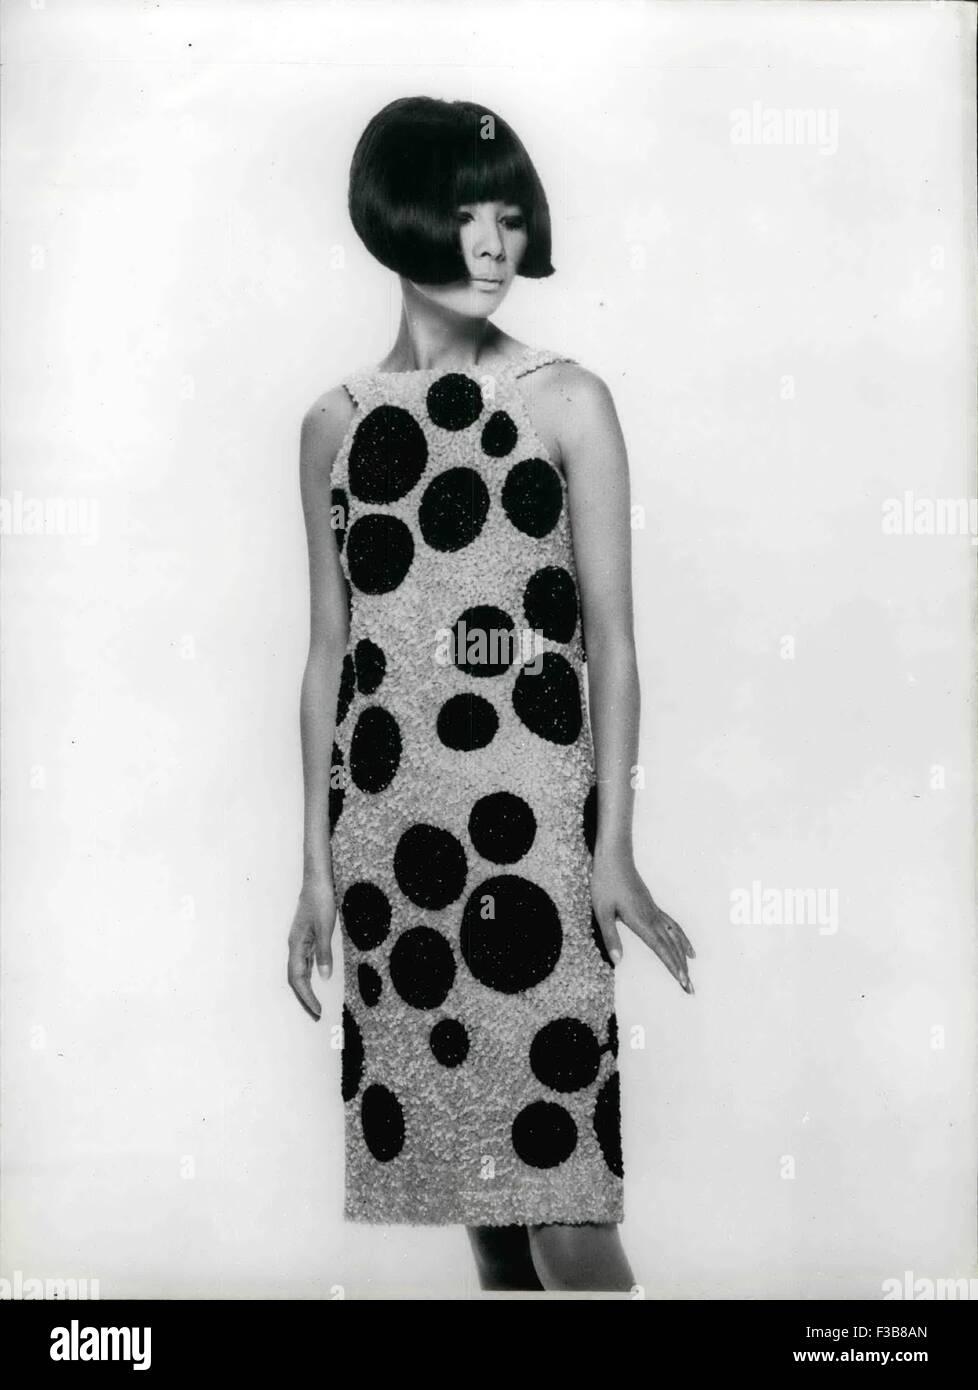 Und Herbst 4Januar KleidRosa 1968 Mode OpsCocktail Winter OkTXiuPZ